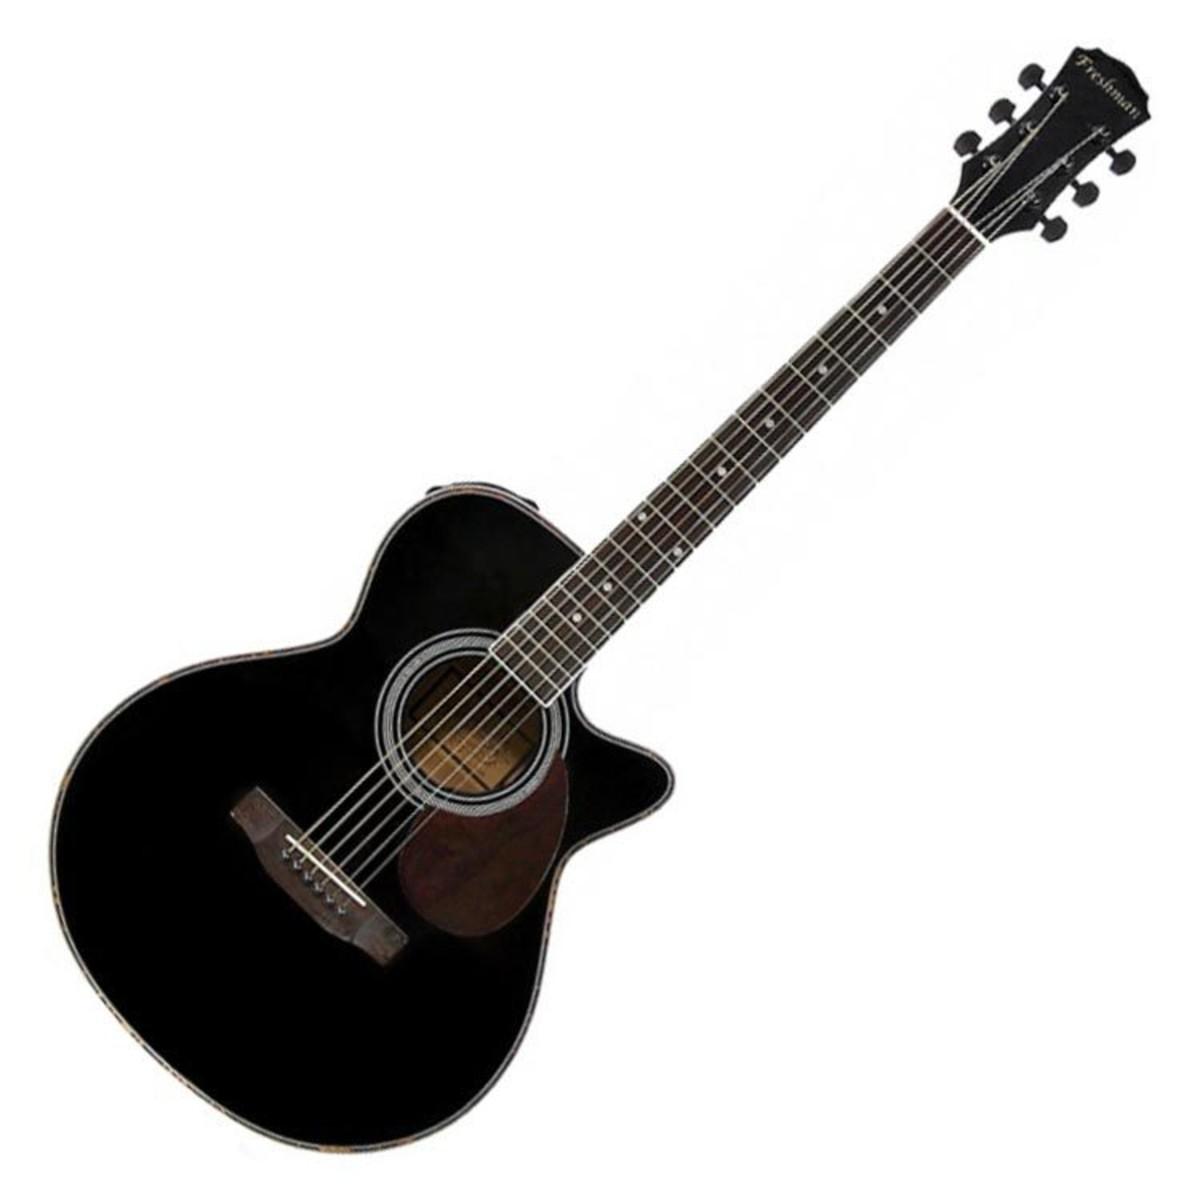 freshman fa1abk folk cutaway electro acoustic guitar black at gear4music. Black Bedroom Furniture Sets. Home Design Ideas